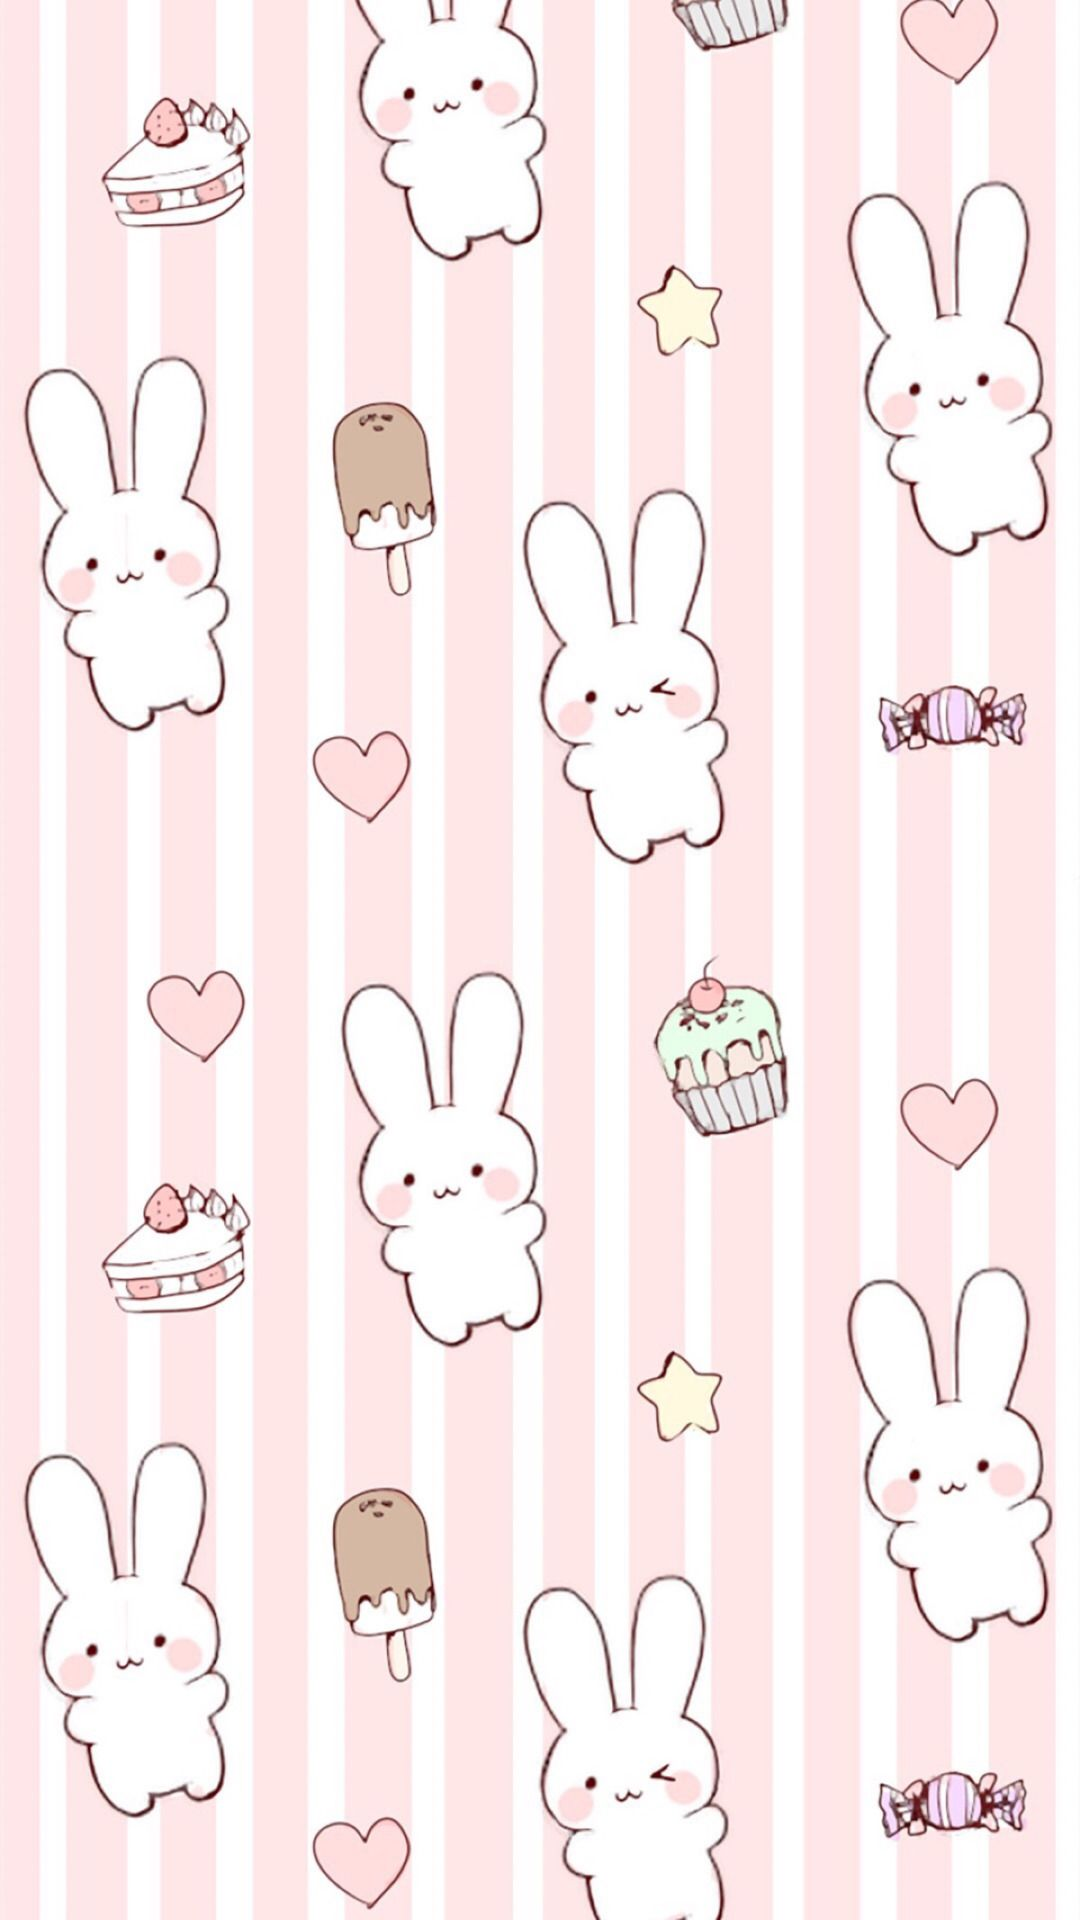 Crazy Cute Wallpapers Bunny Wallpaper Rabbit Wallpaper Cute Wallpaper For Phone